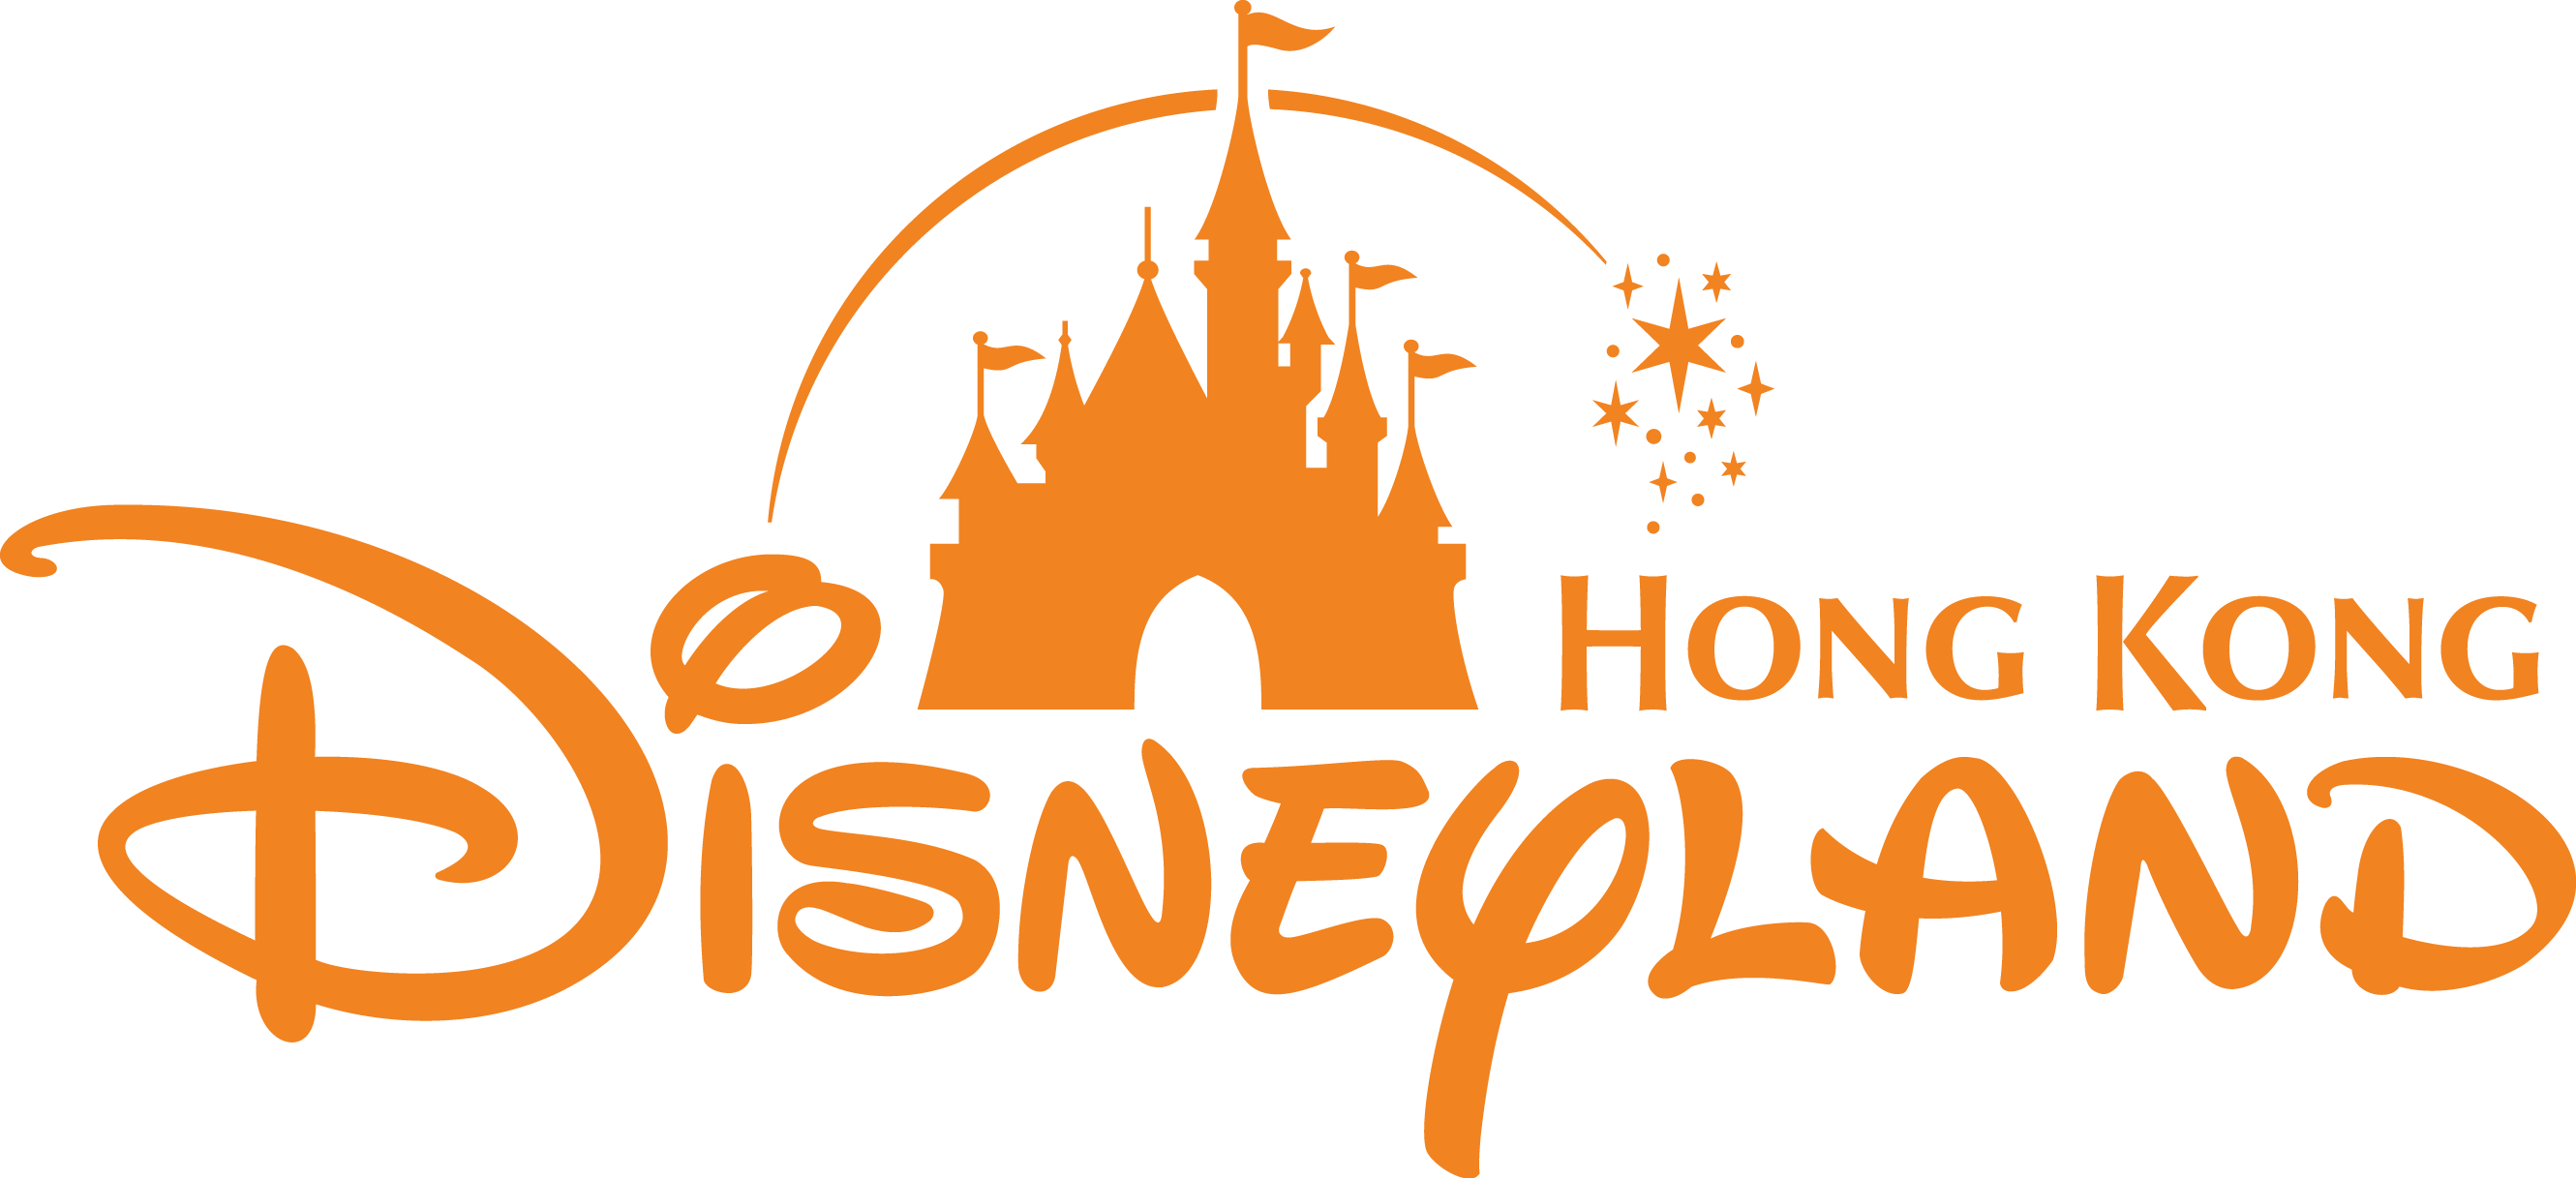 picture freeuse library Disneyland clipart disneyland hong kong